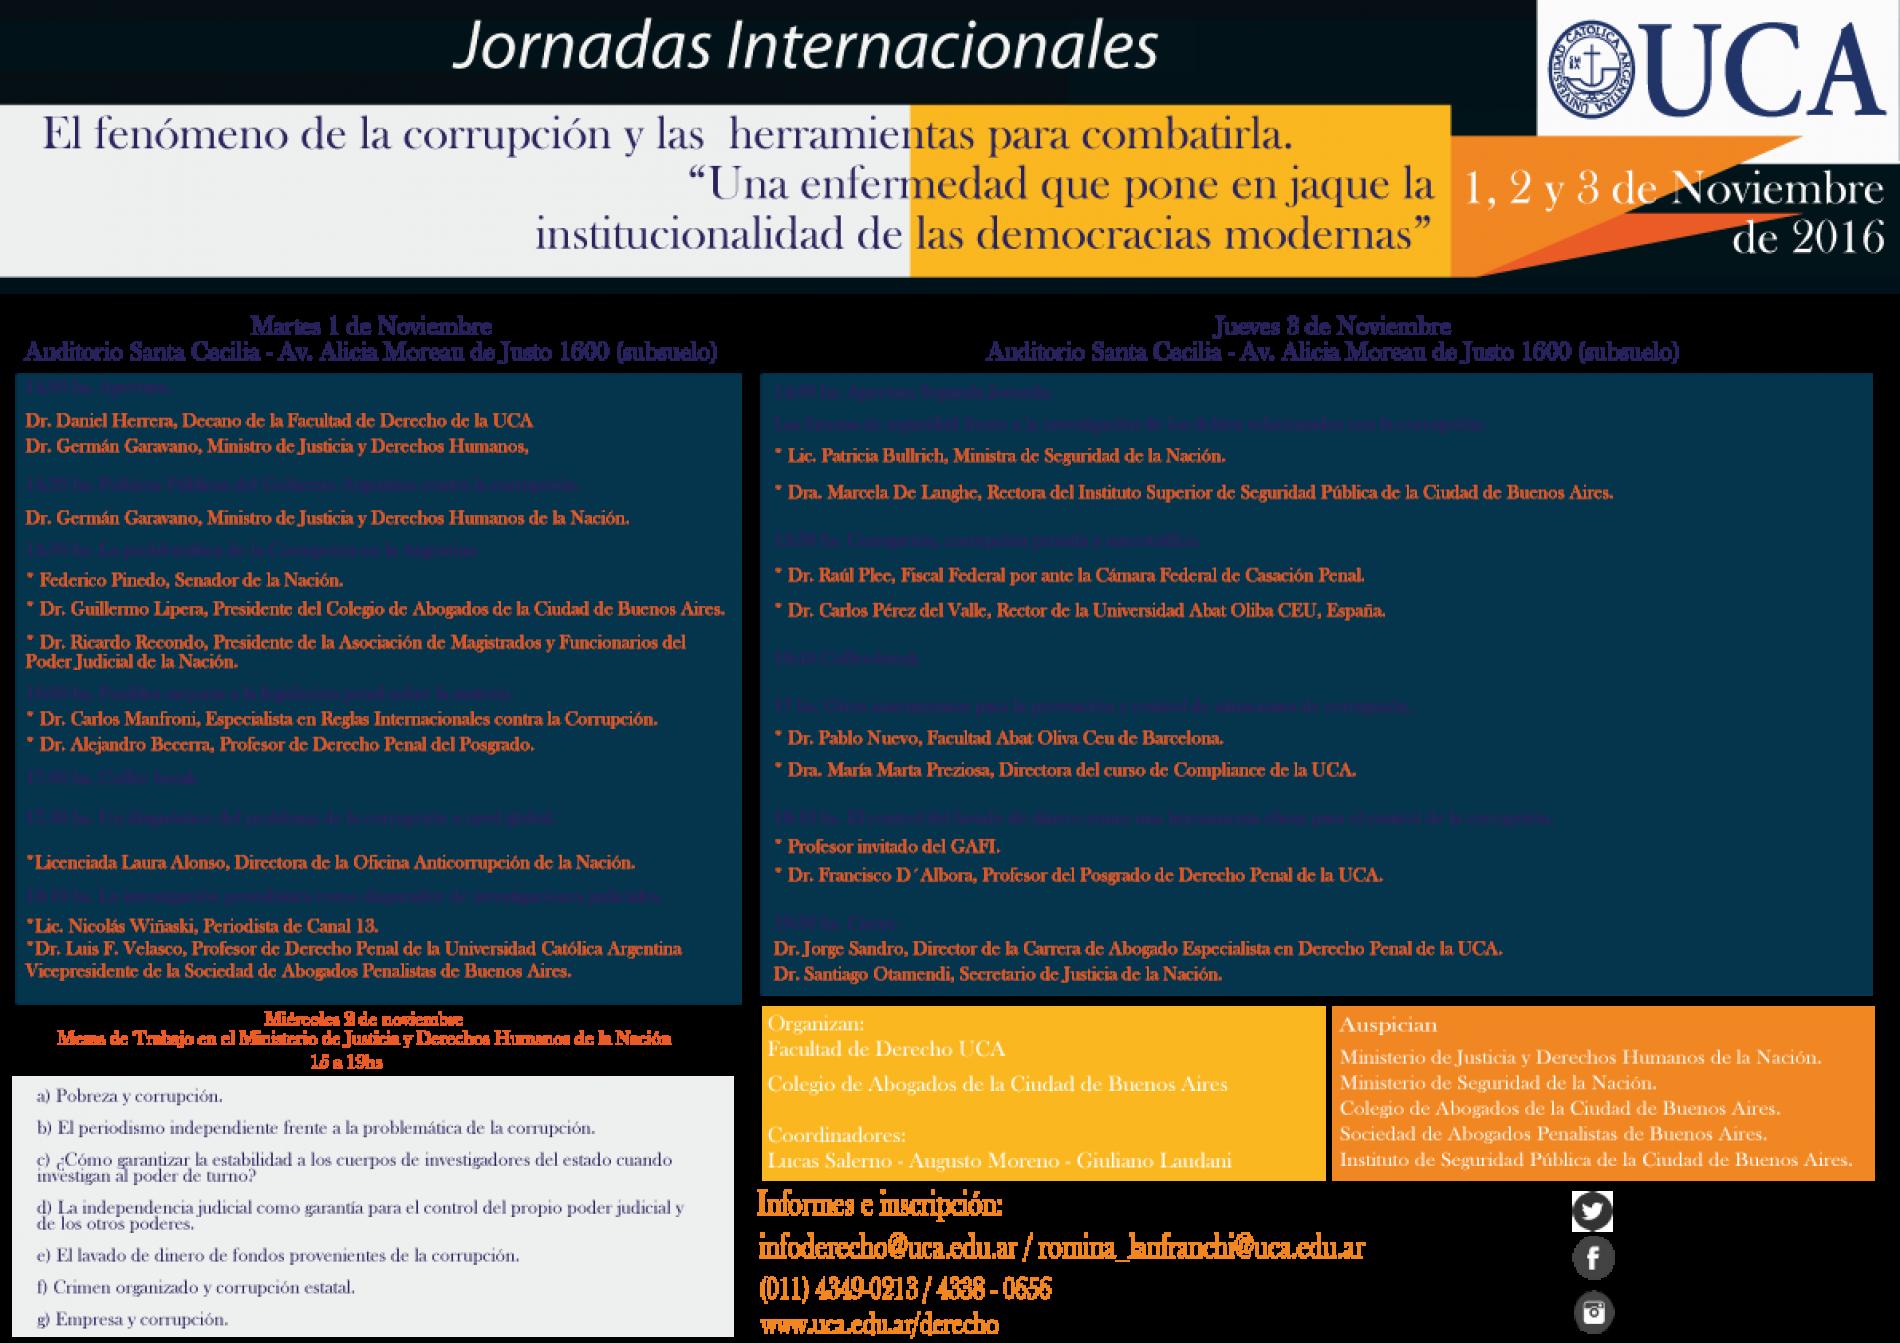 JORNADAS INTERNACIONALES UCA